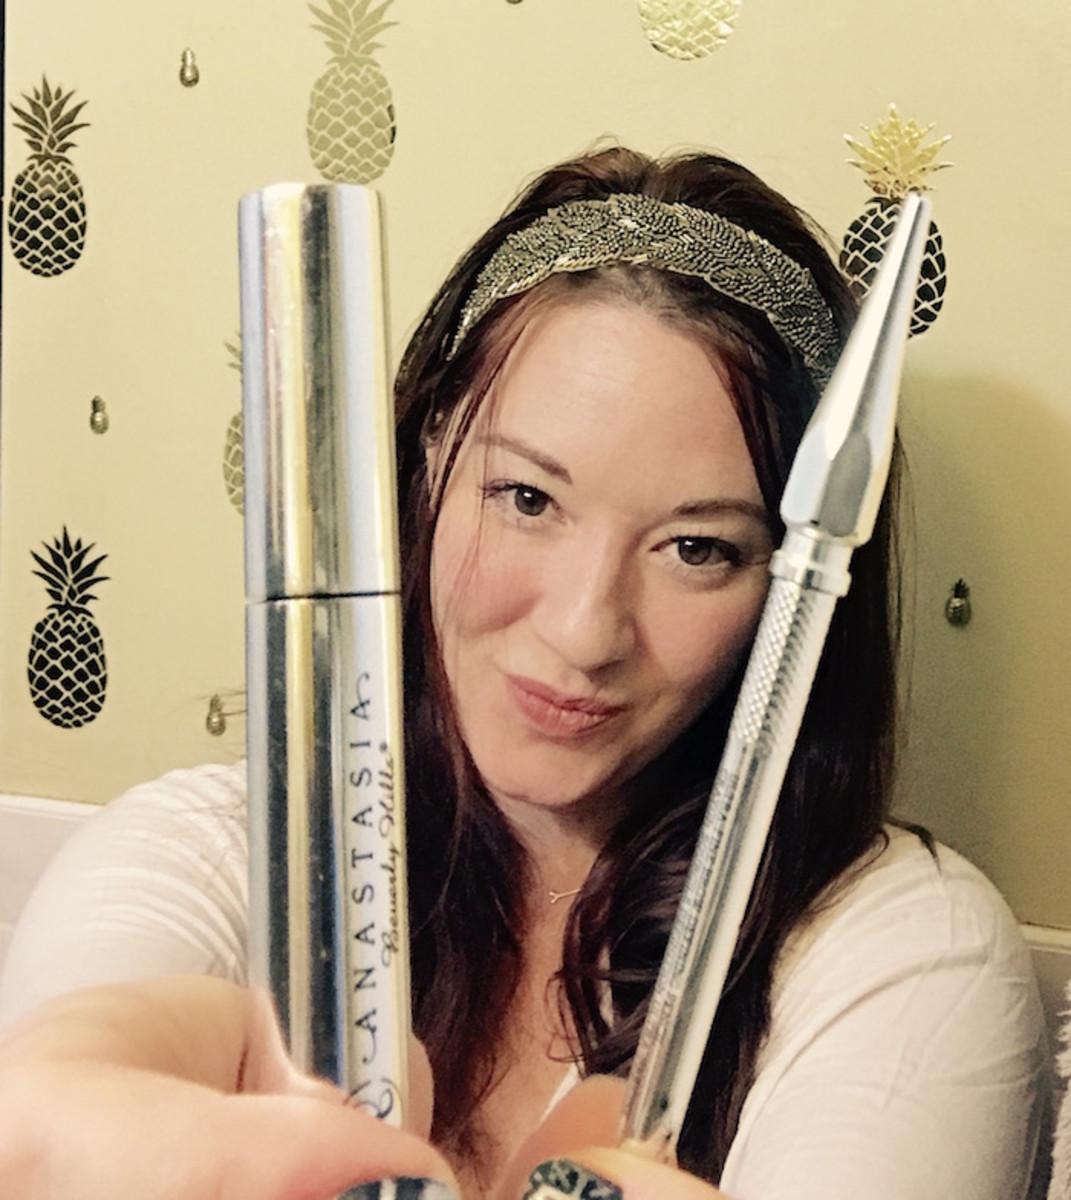 benefit-anastasia-brow-pencil-gel-makeup-beauty-review